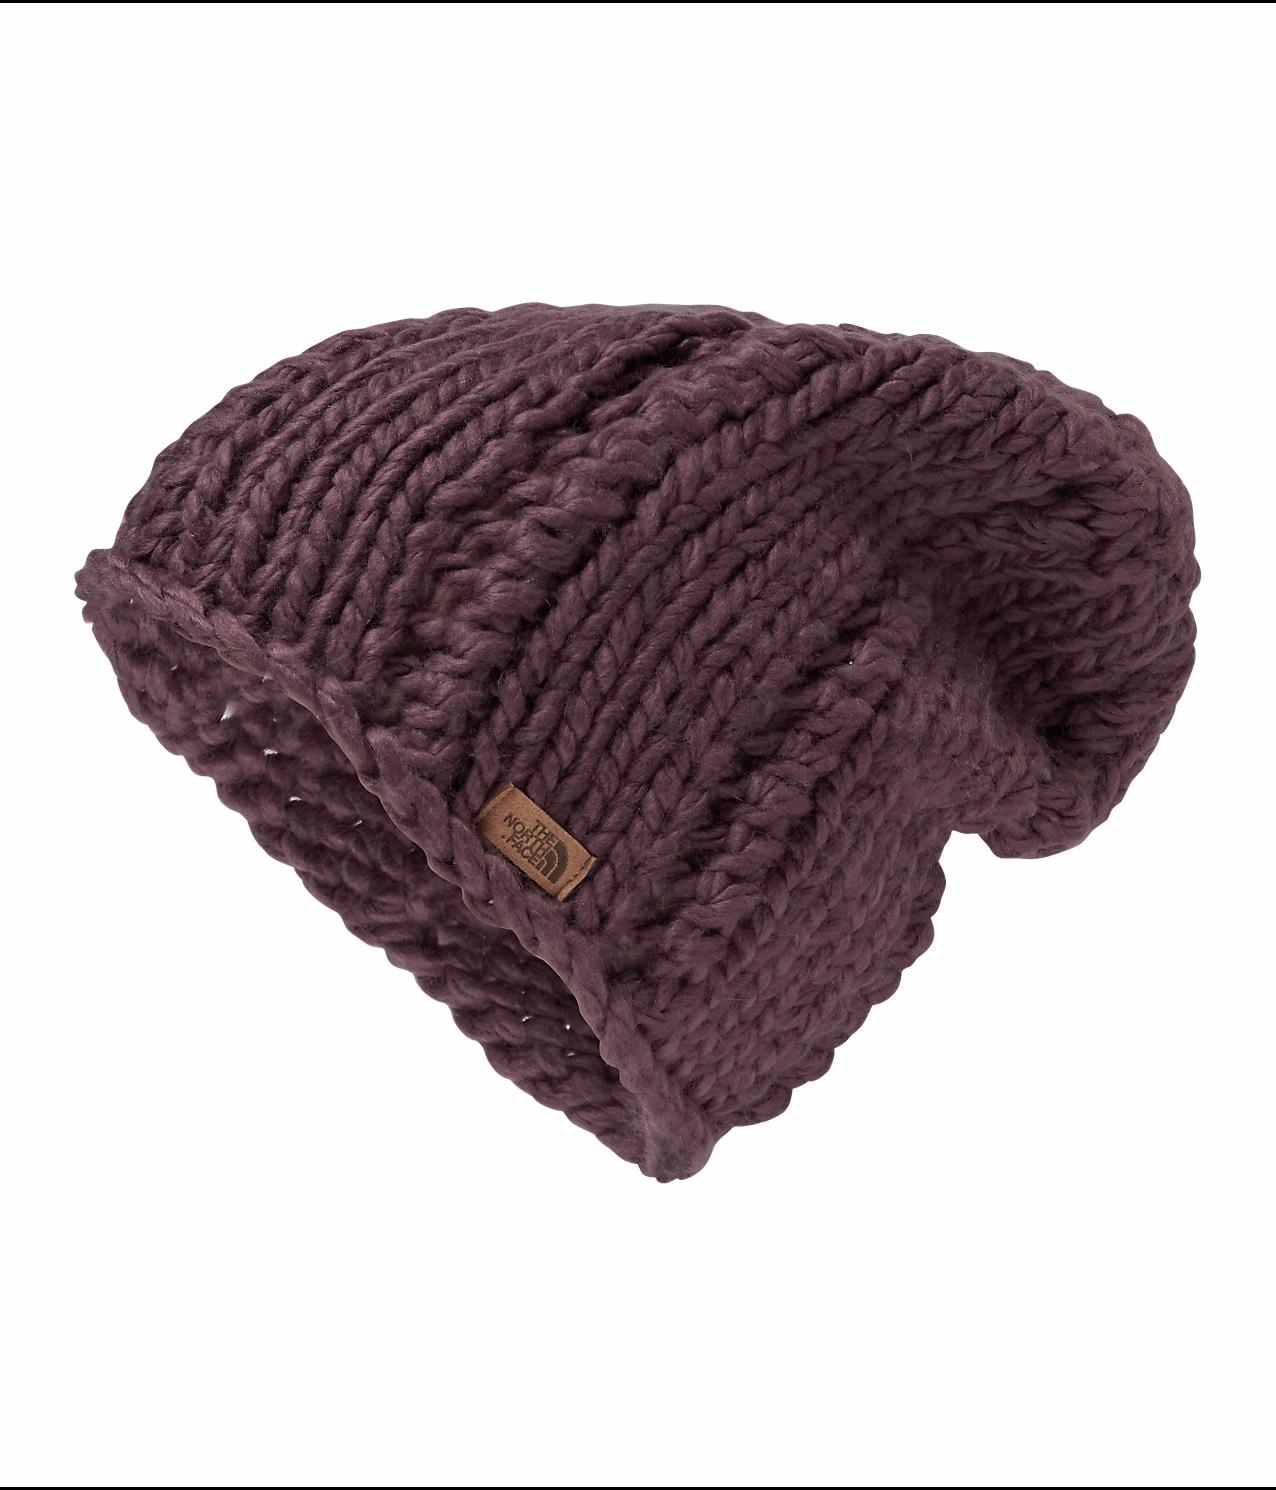 2017/18 TNF Chunky Knit Beanie